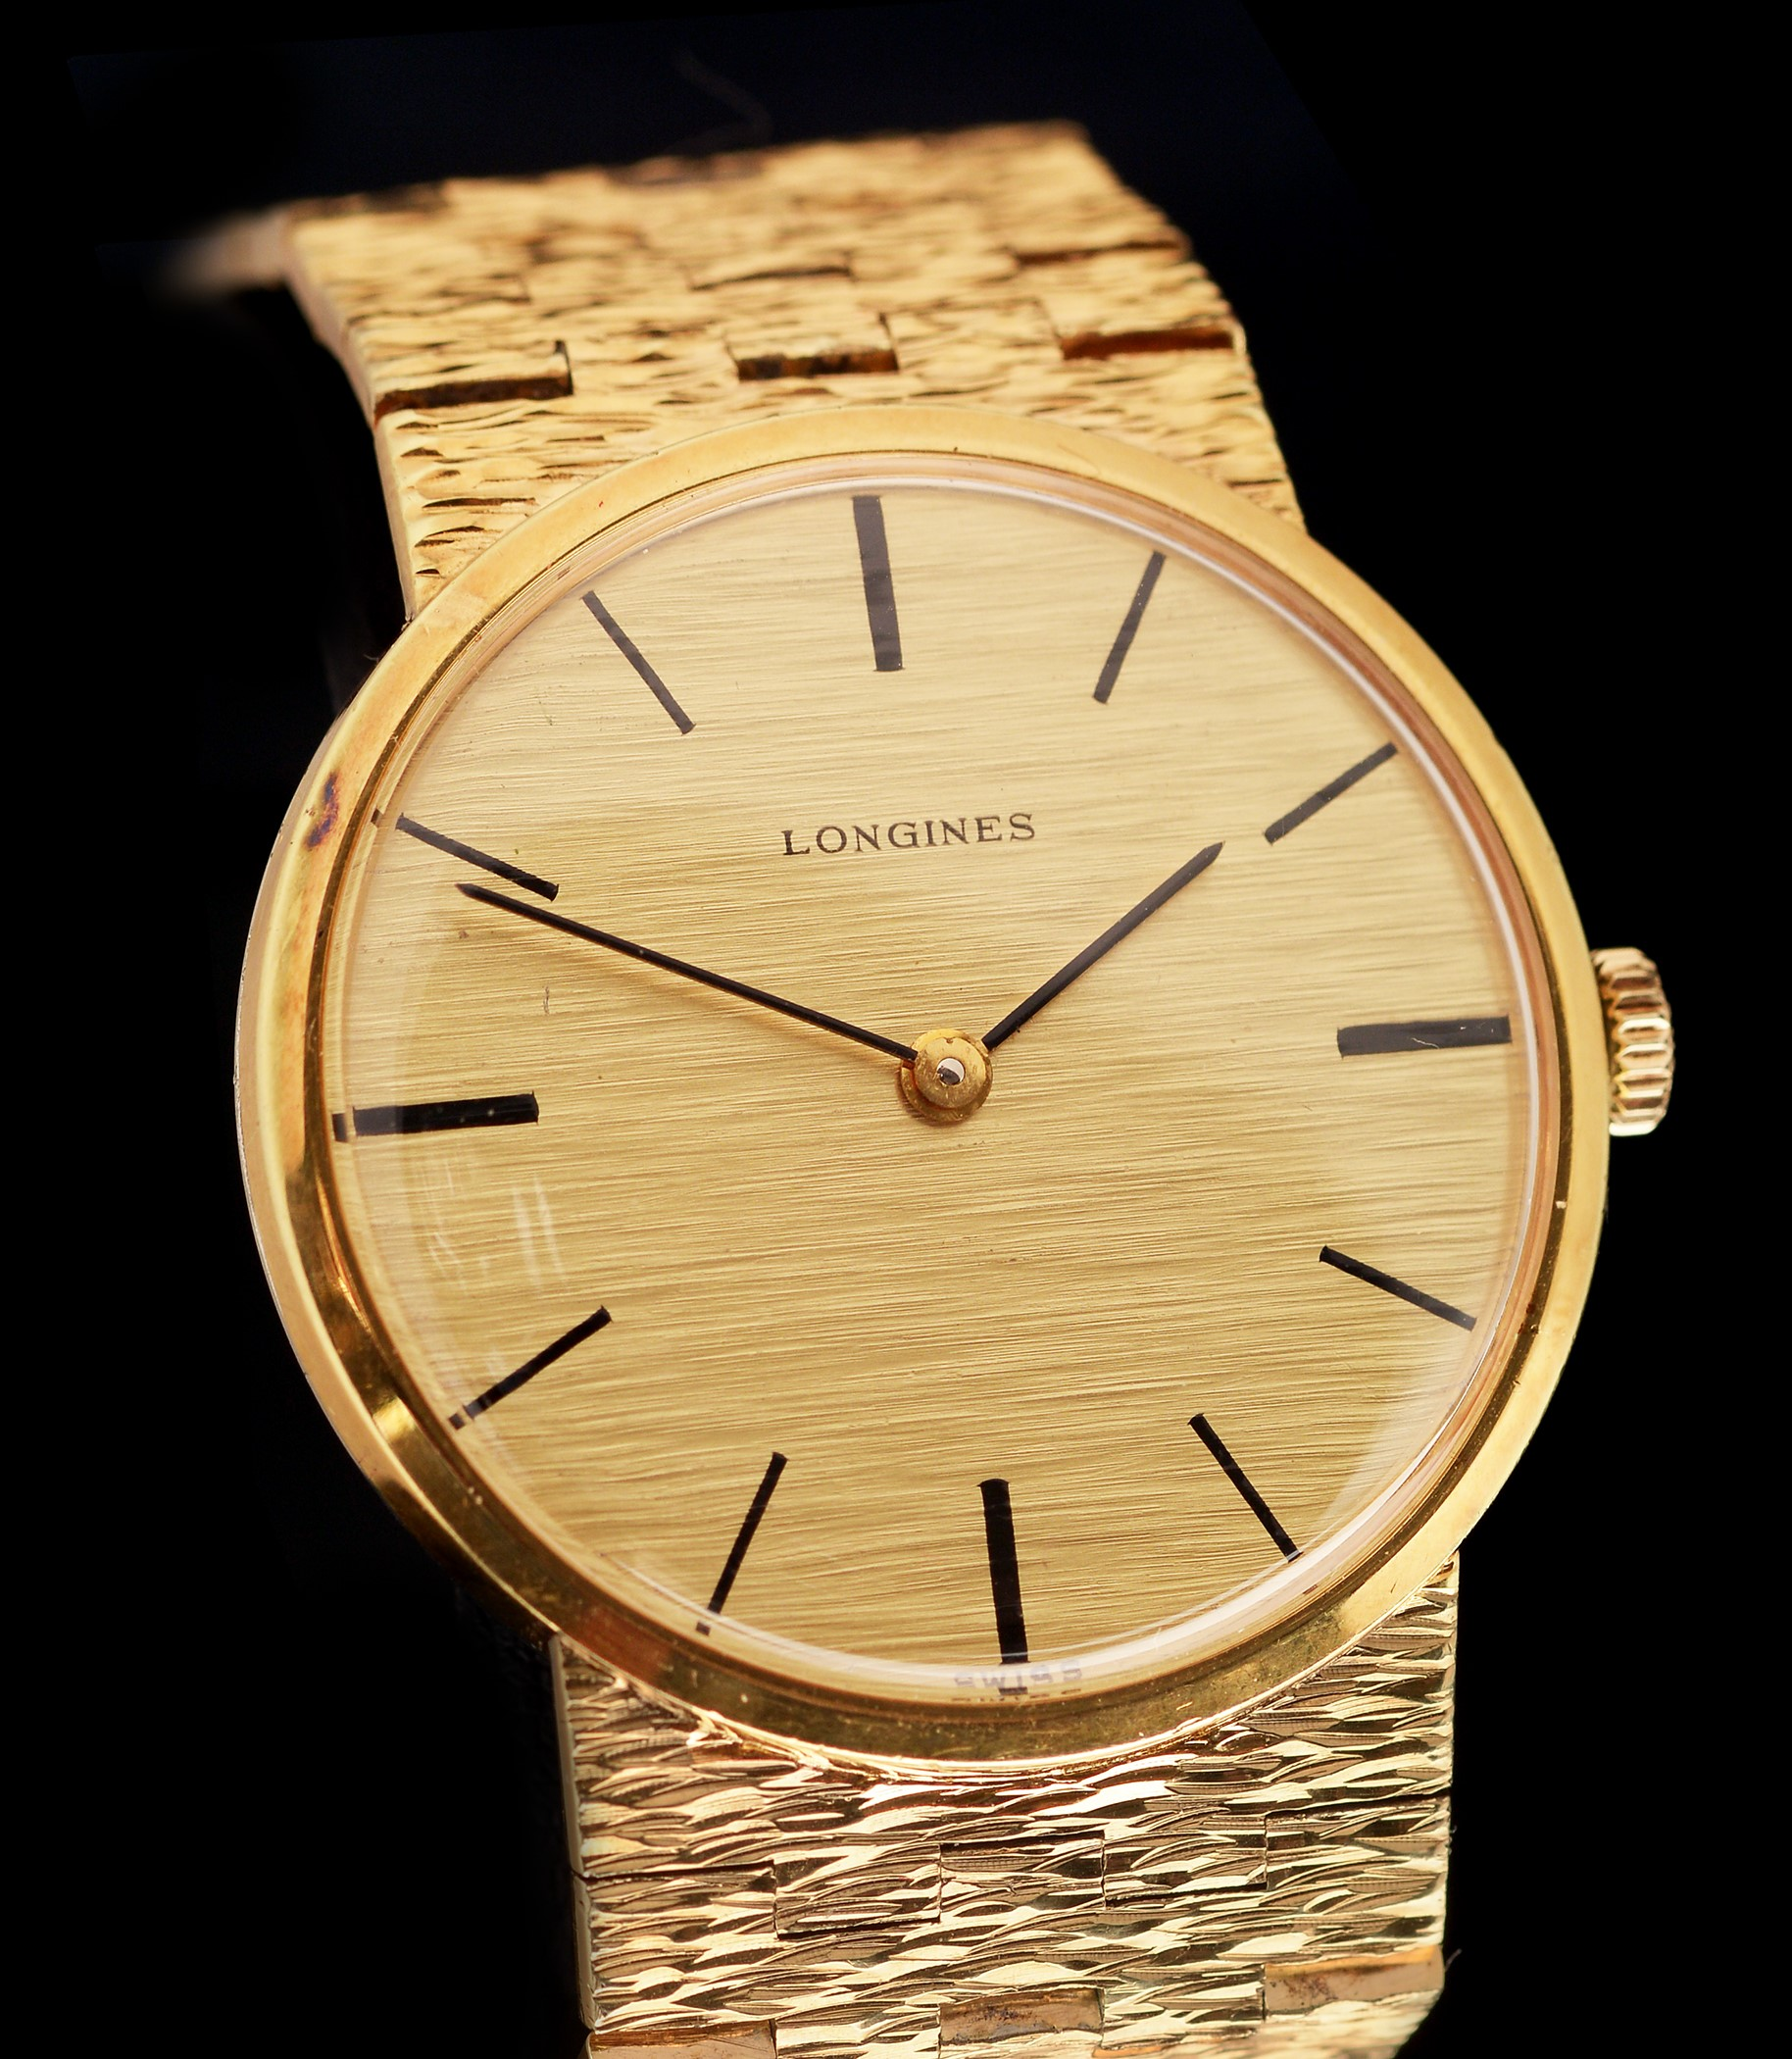 Lot 22 - Longines lady's watch